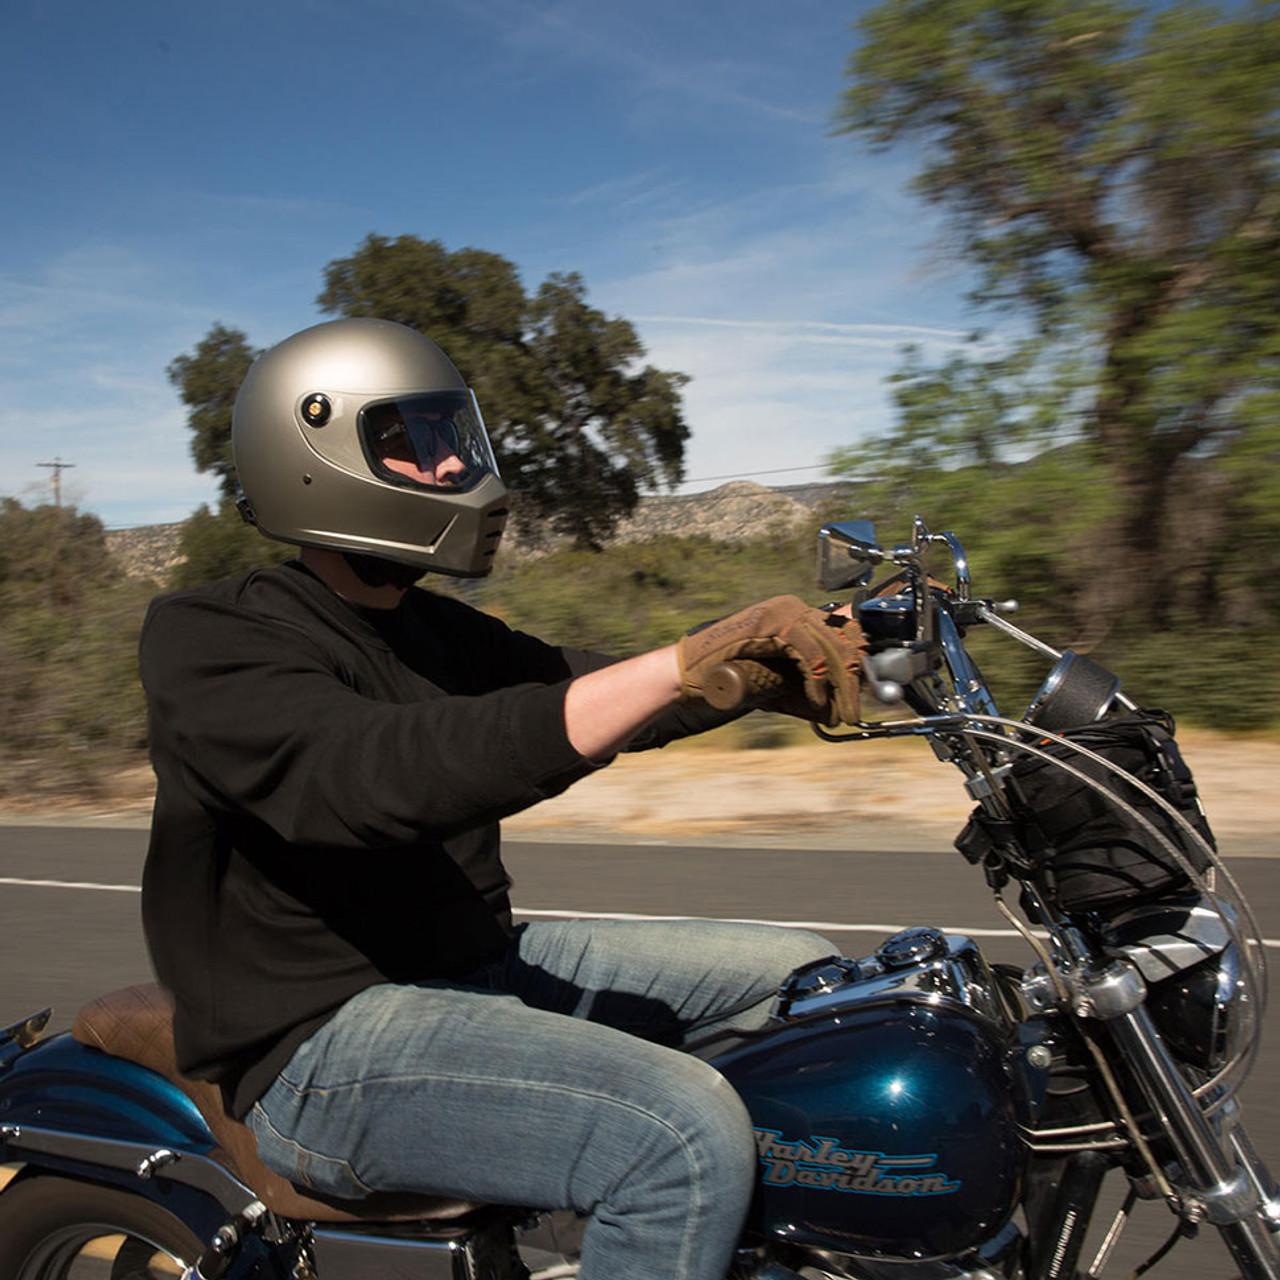 c1bbc65e Biltwell Lane Splitter Helmet - Flat Titanium - Get Lowered Cycles